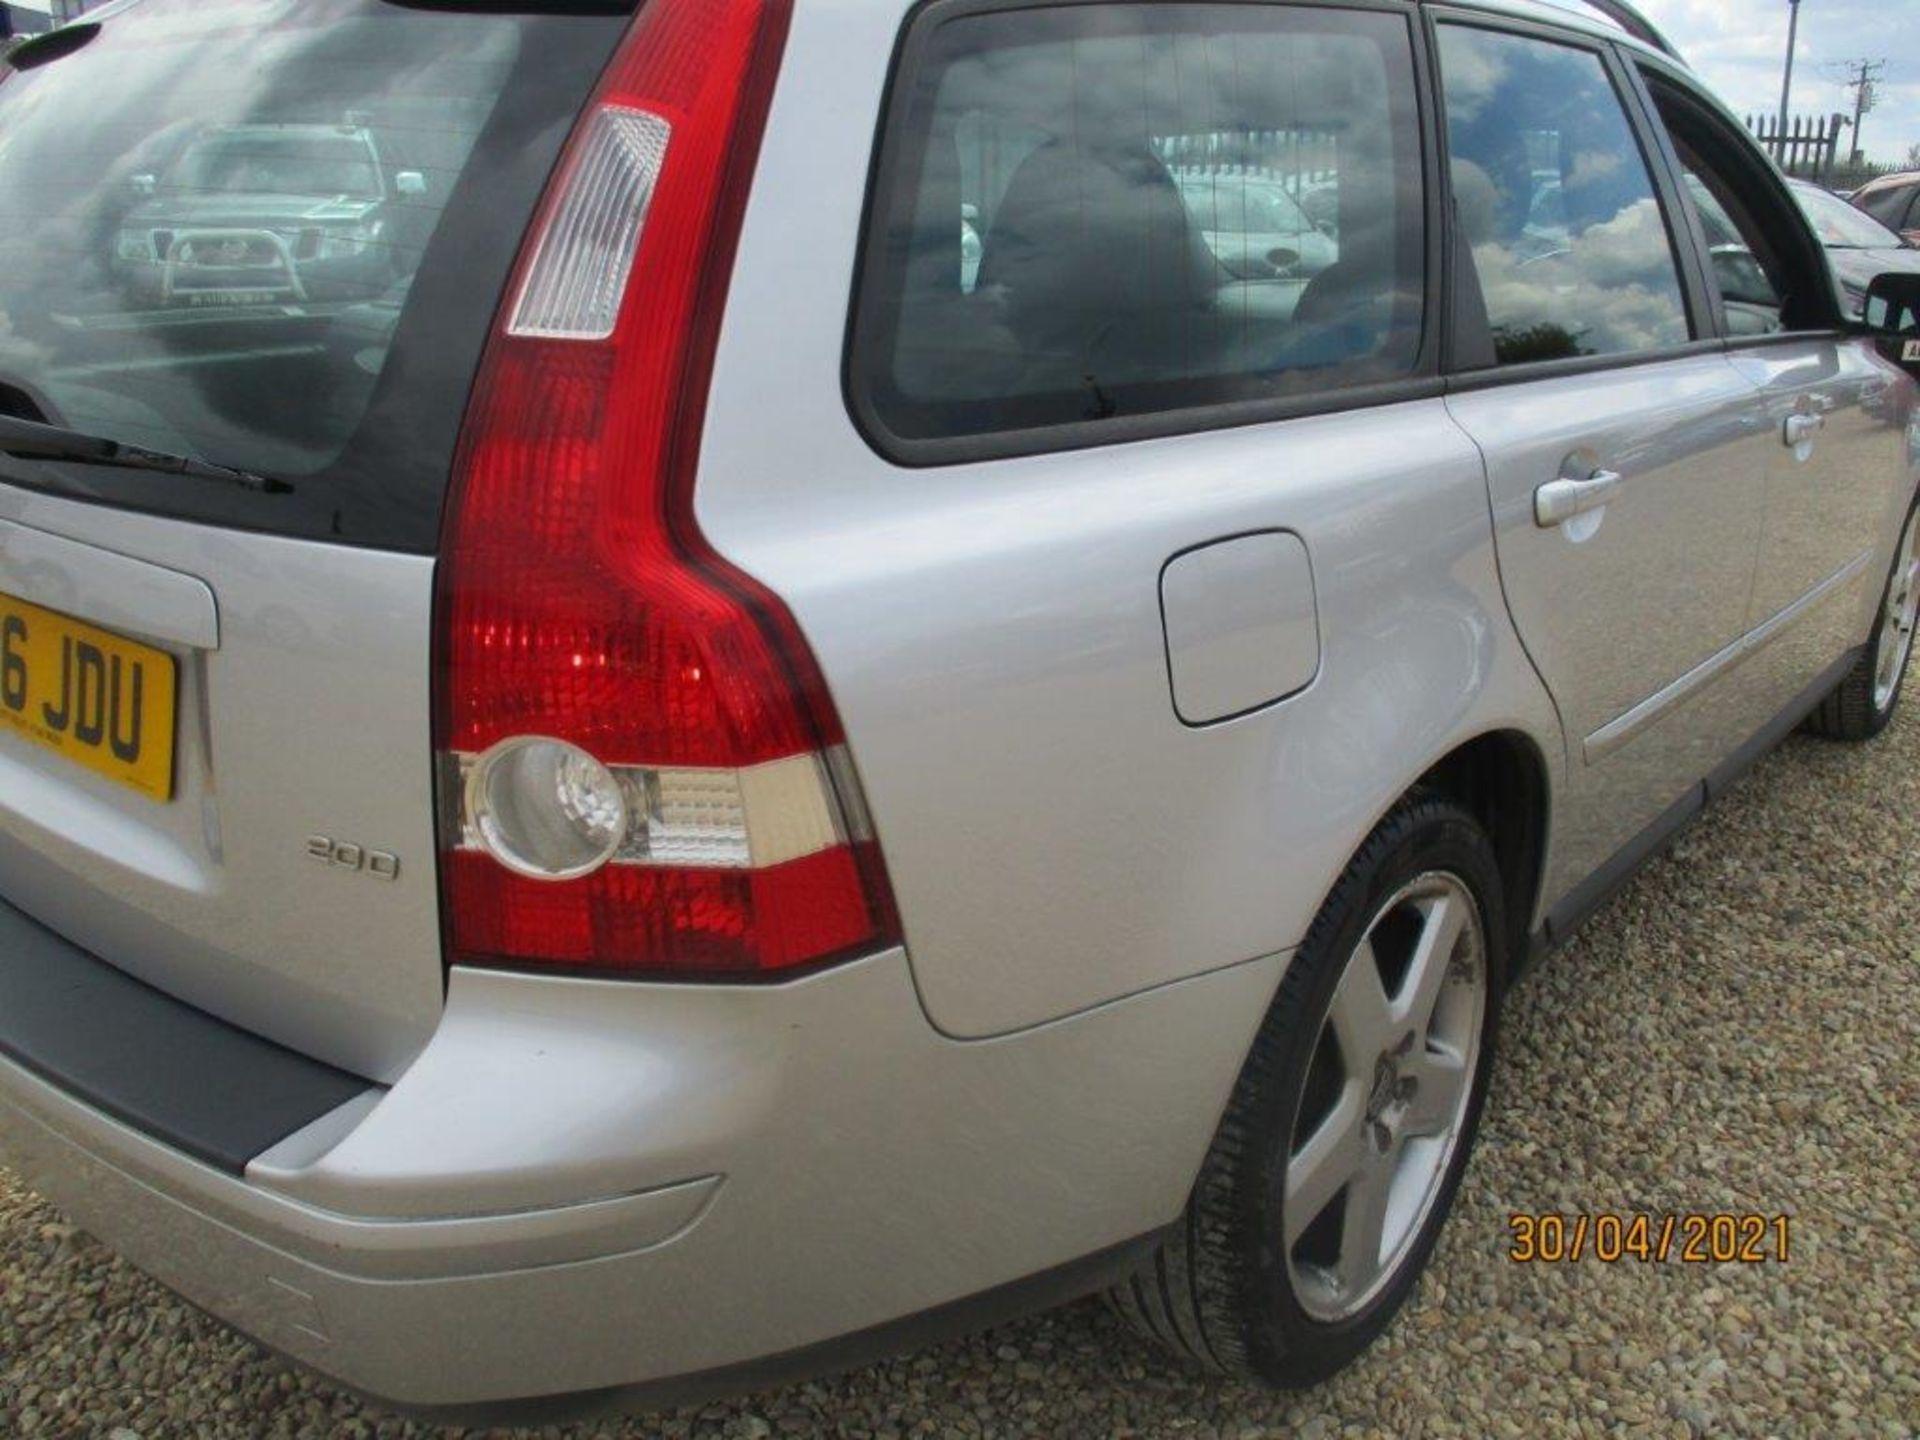 06 06 Volvo V50 SE D (E4) Est - Image 9 of 26